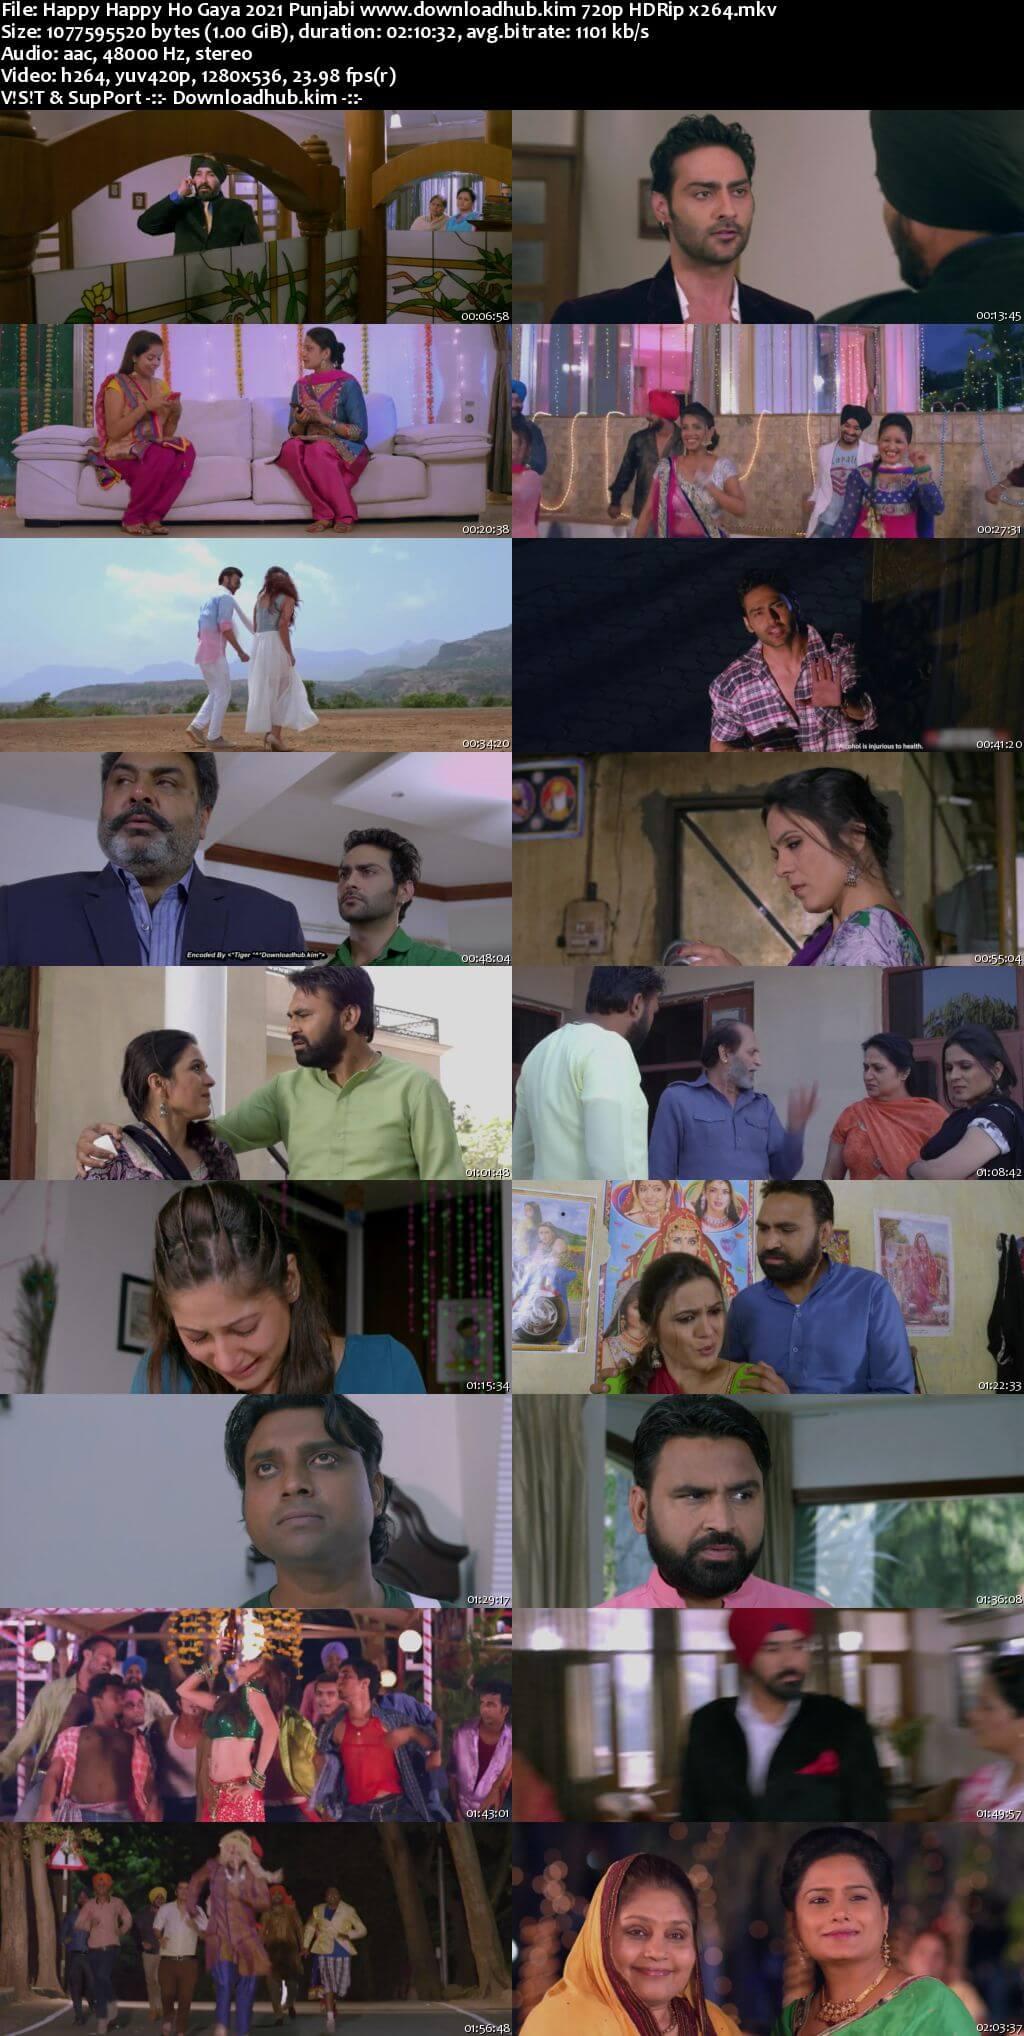 Happy Happy Ho Gaya 2021 Punjabi 720p HDRip x264